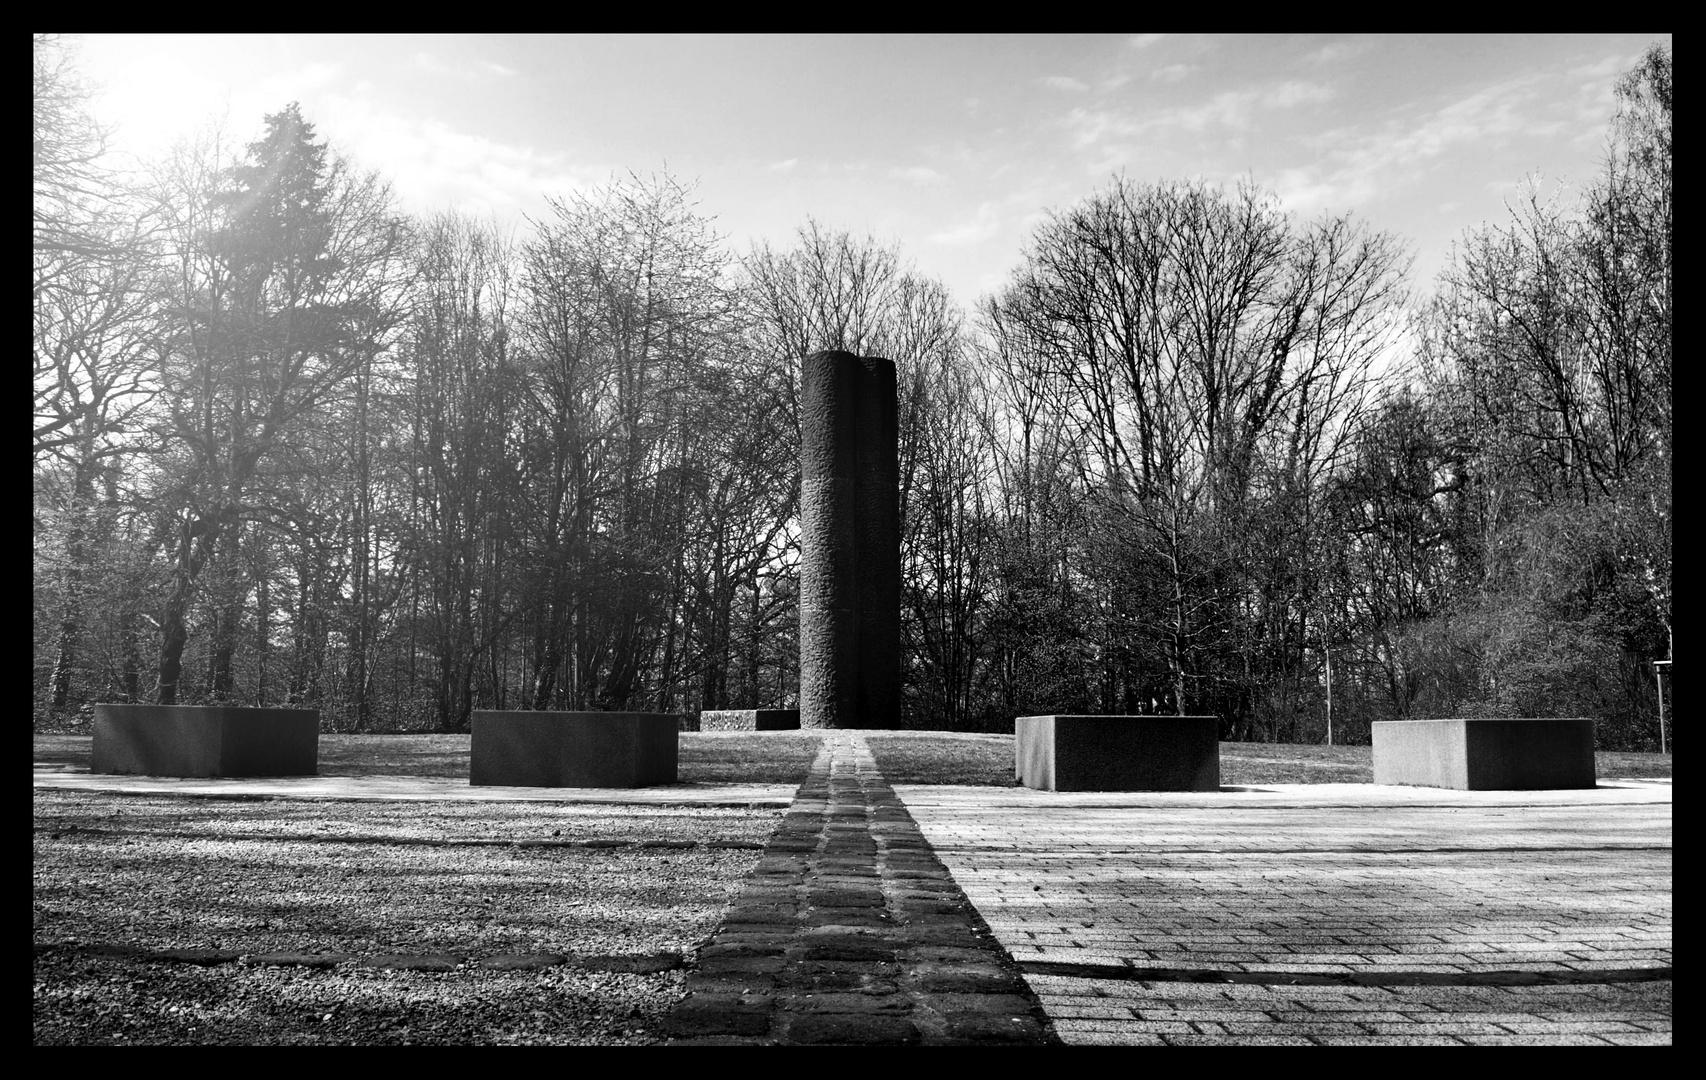 Rittersturz Denkmal in Koblenz